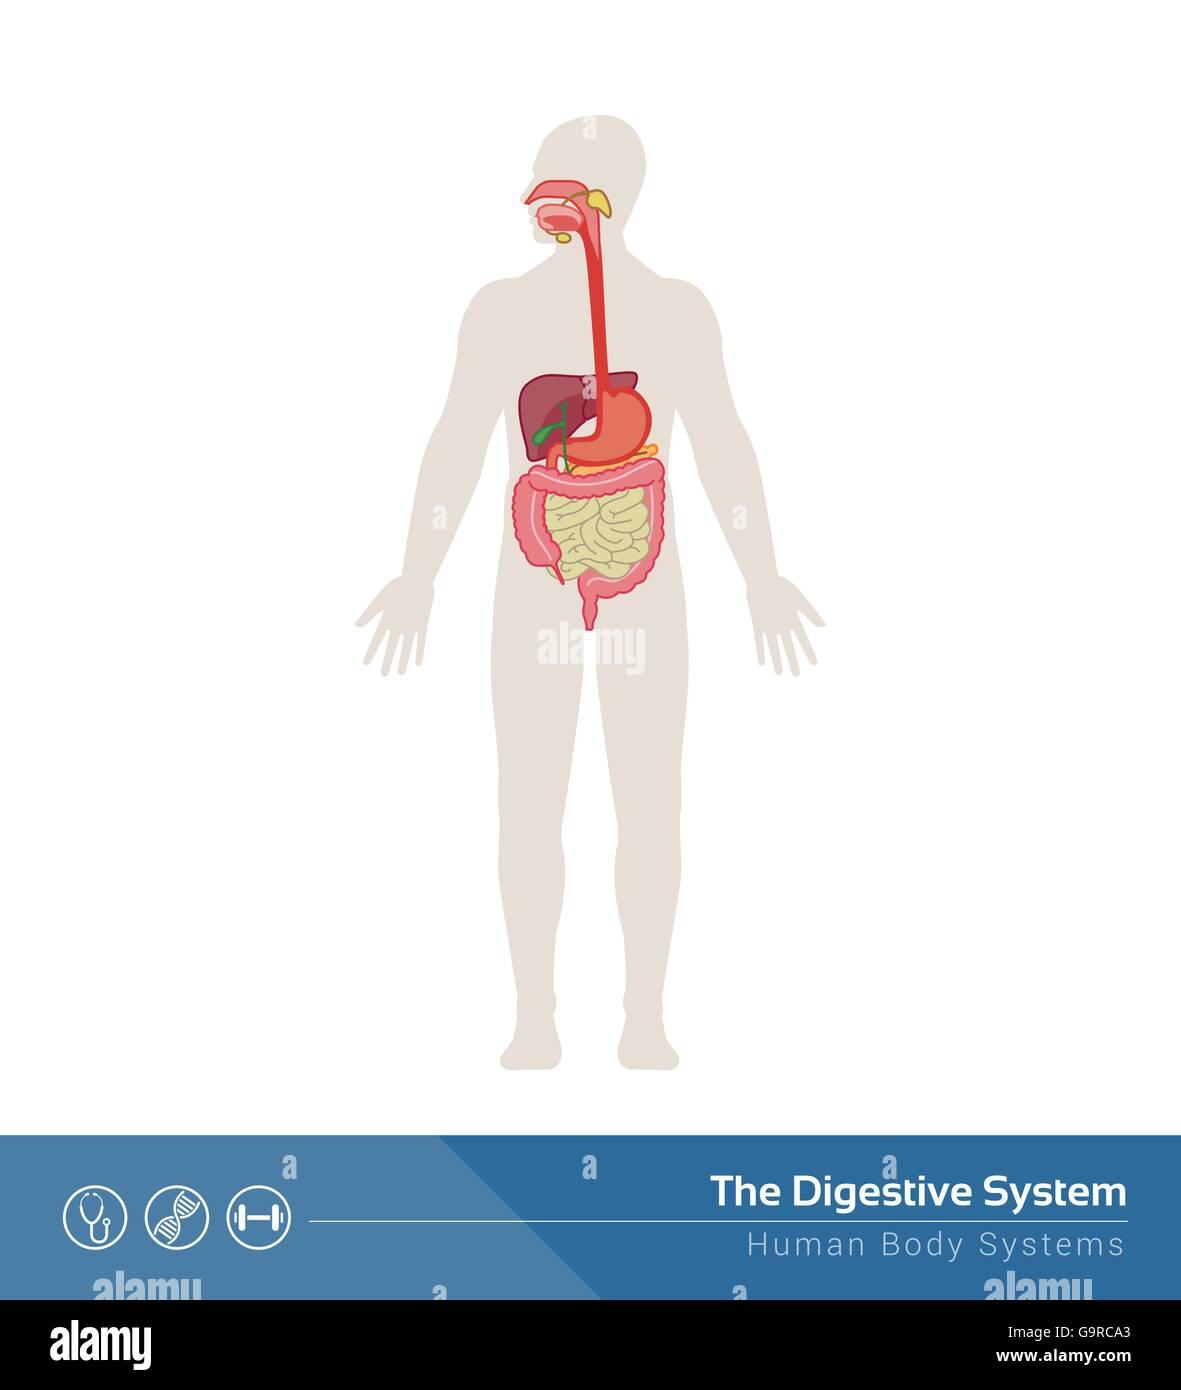 Human Body Anatomy Organs Stock Photos & Human Body Anatomy Organs ...